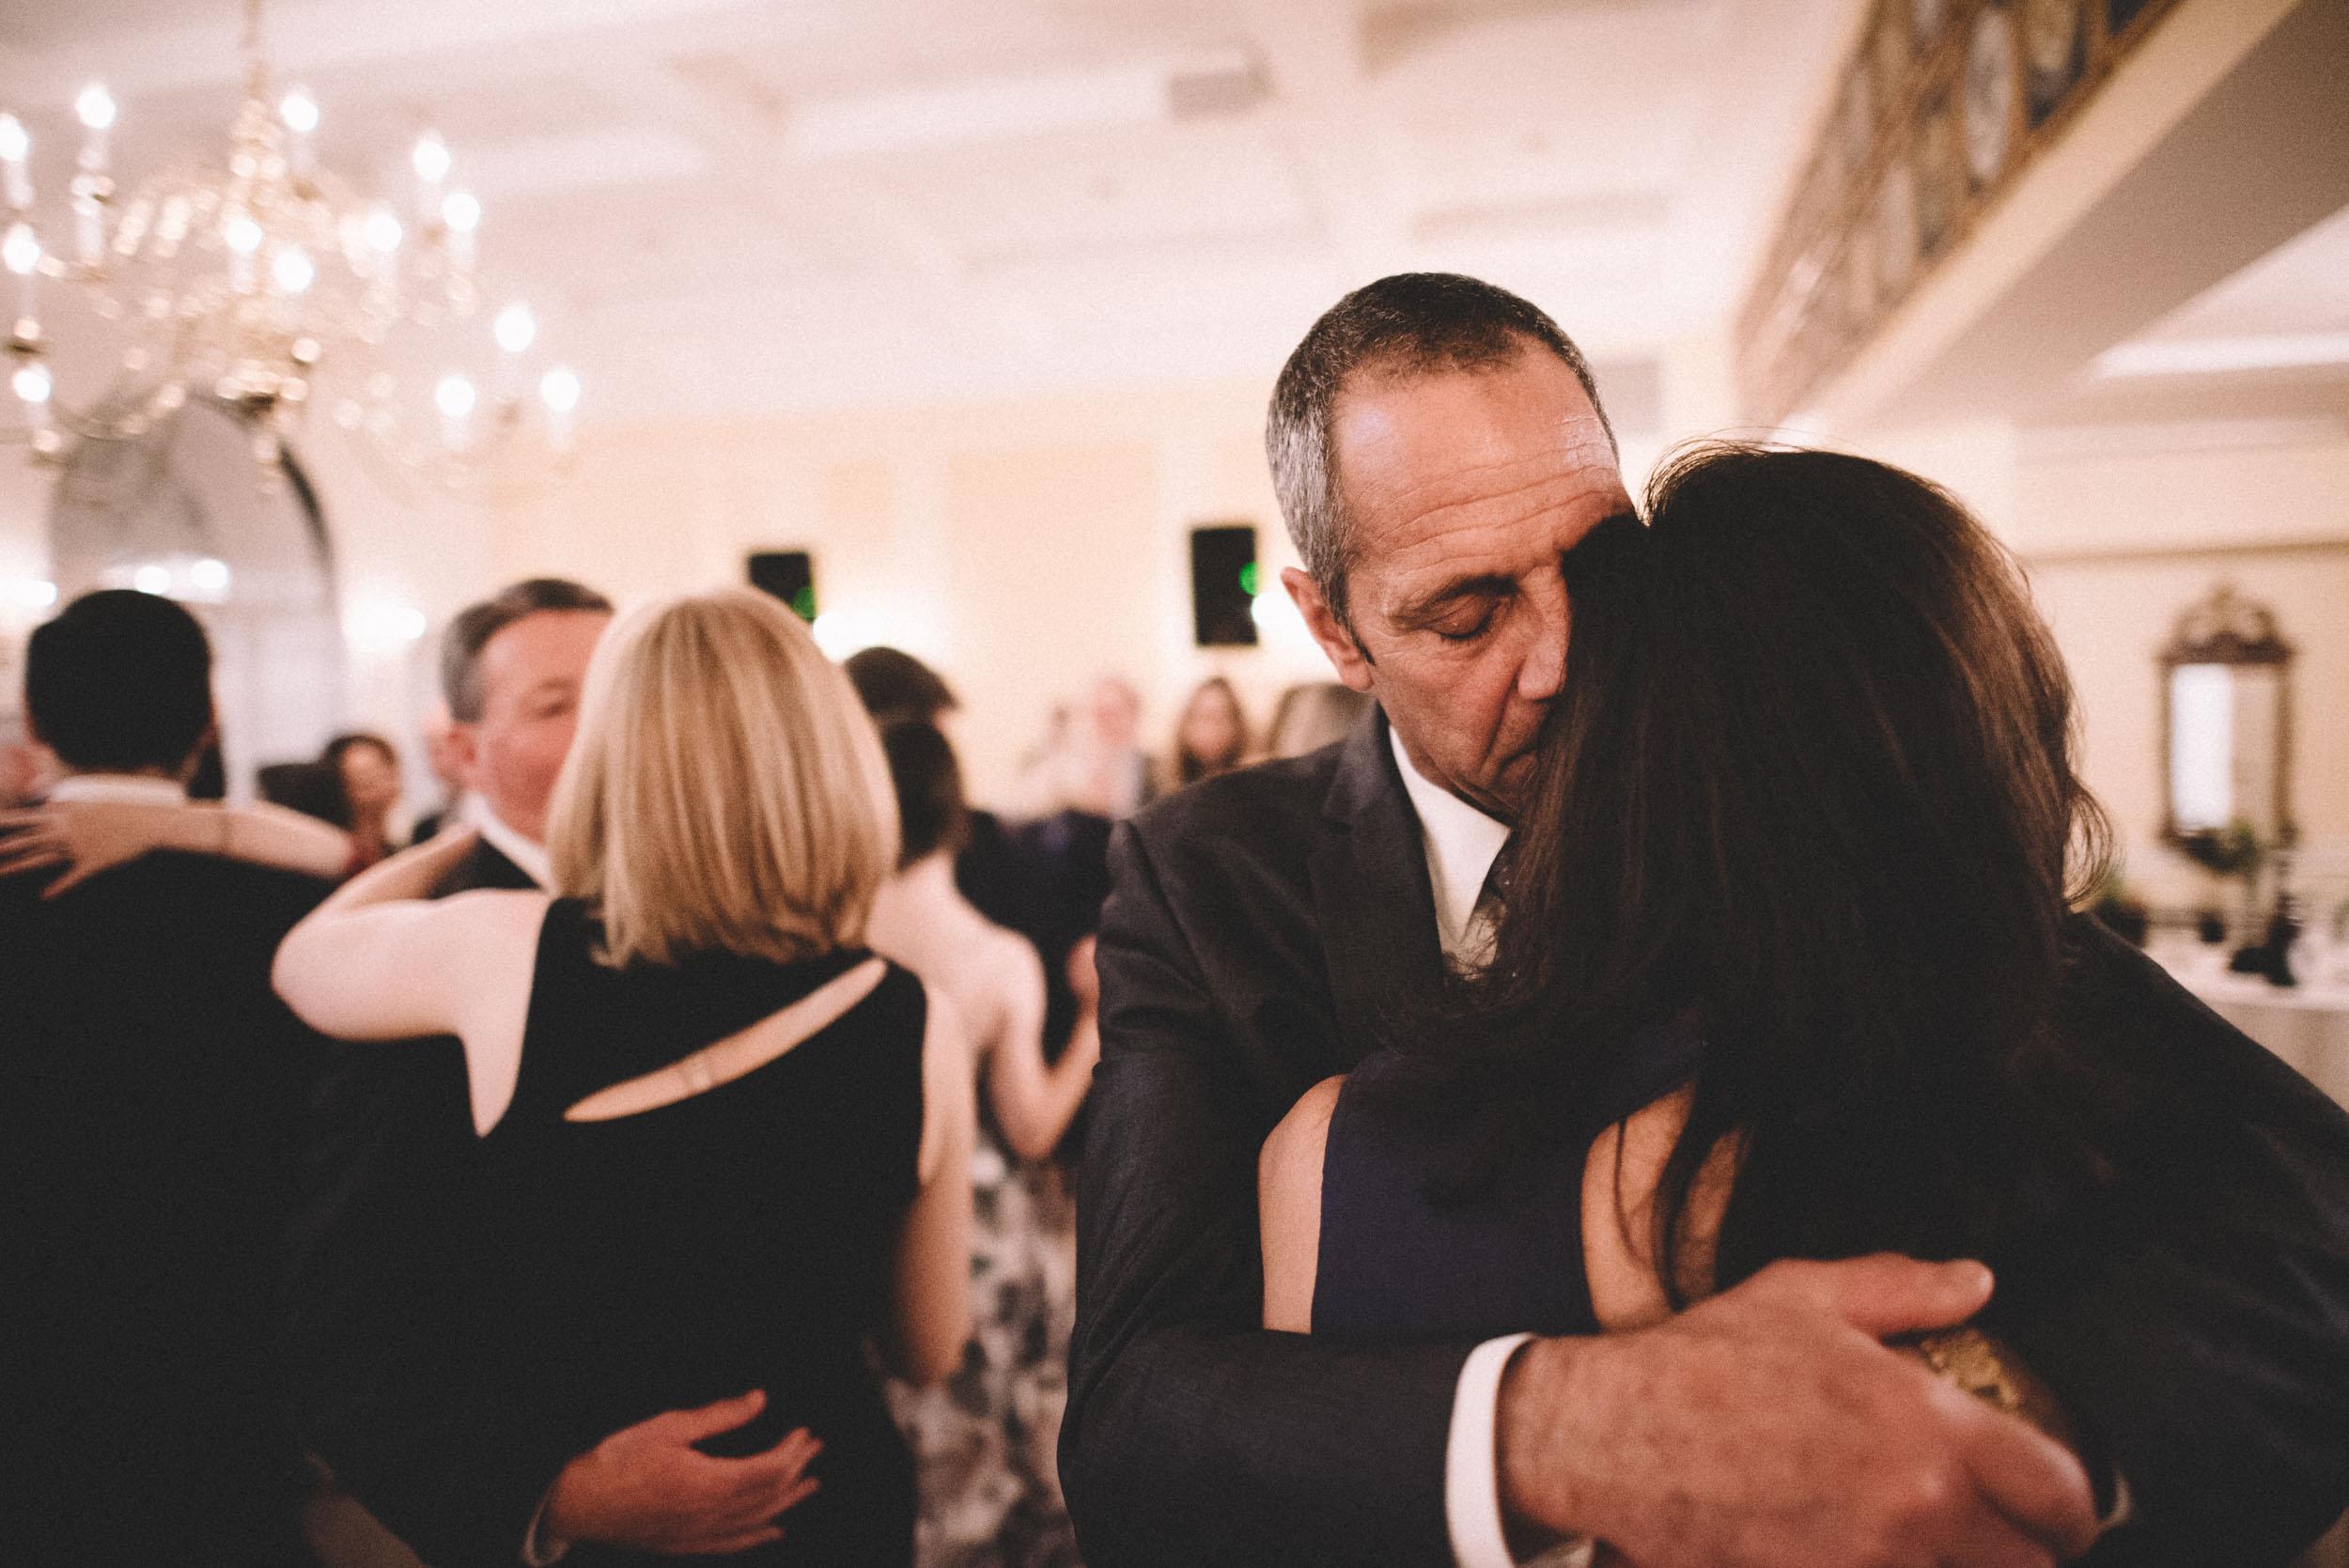 Dumbarton-House-wedding-84.jpg